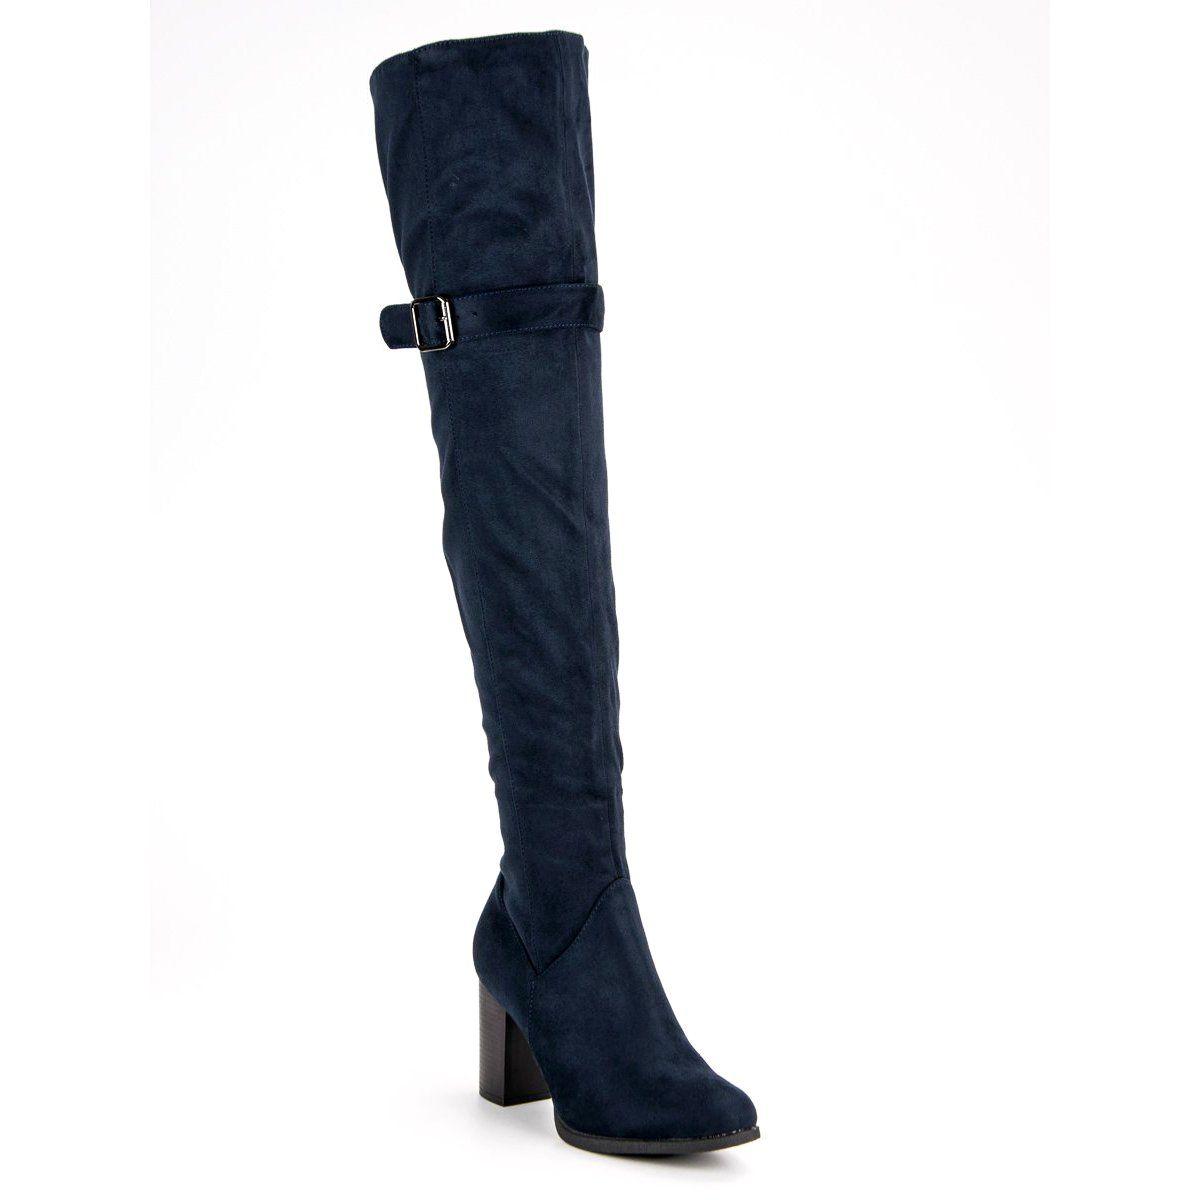 Sds Granatowe Muszkieterki Na Slupku Niebieskie Boots Knee Boots Over Knee Boot